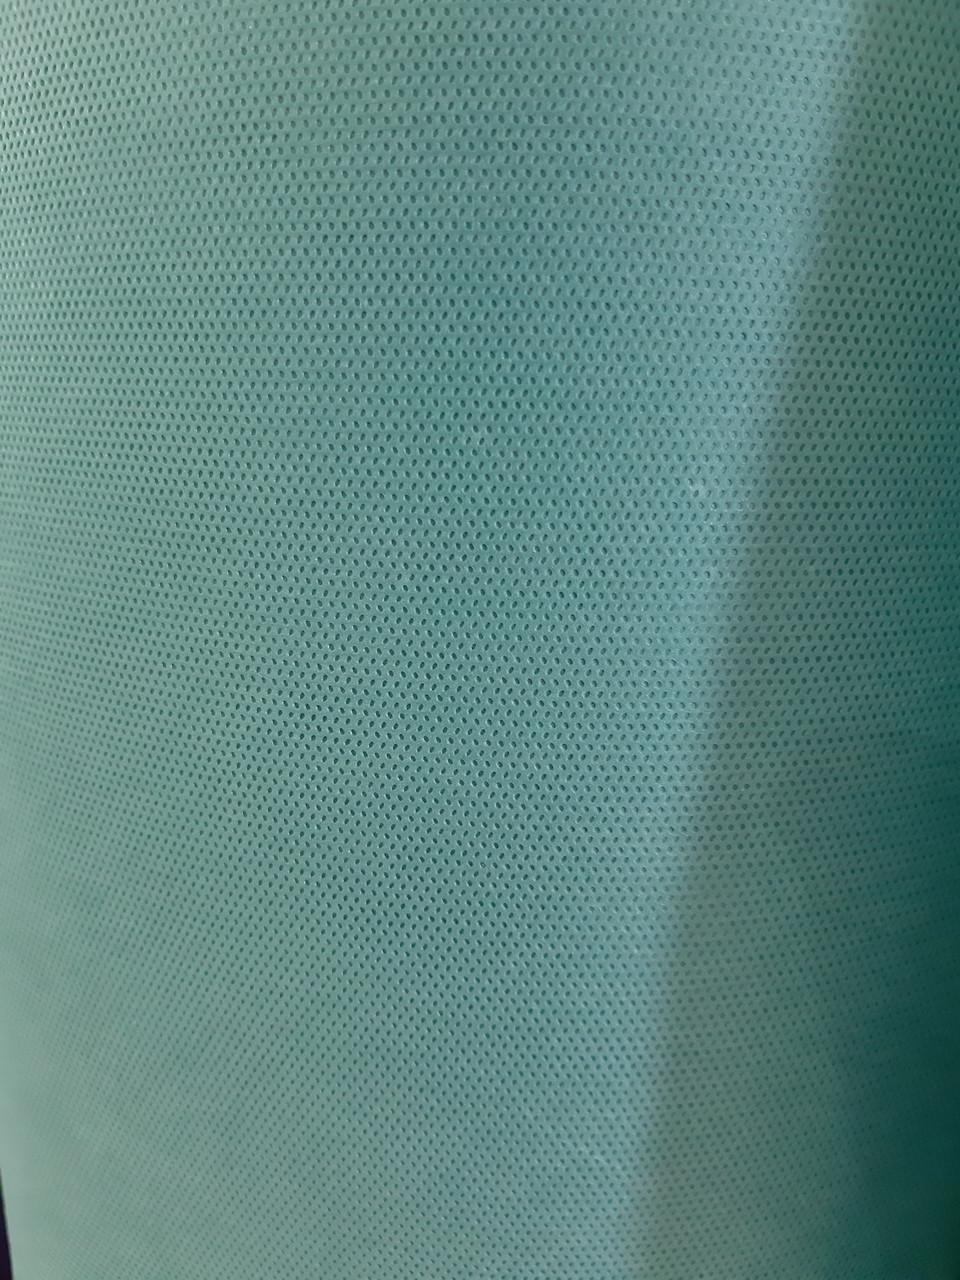 Спанбонд 70 г/м цв зеленый ширина 160см (рул 100м)